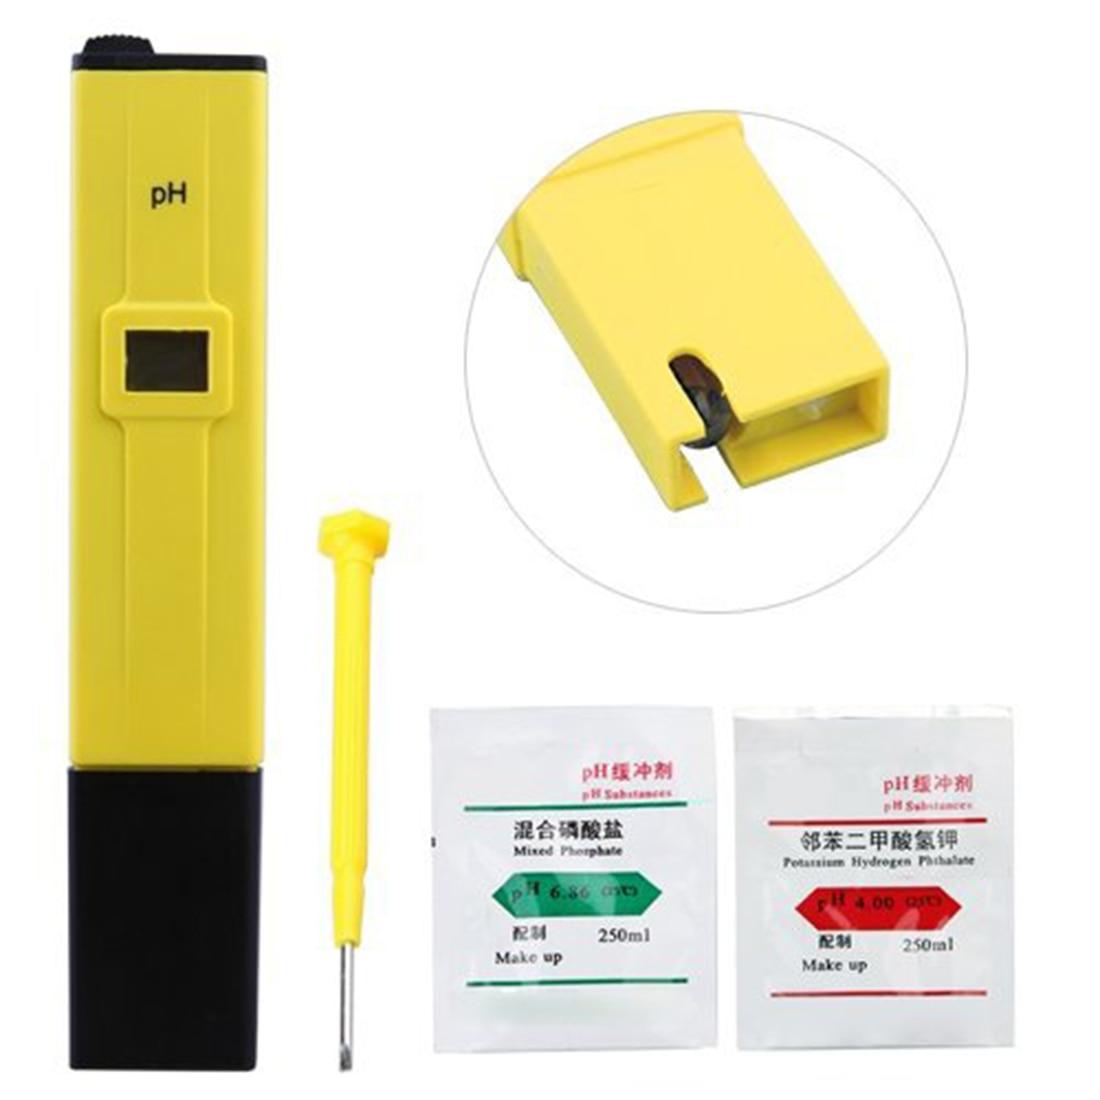 Aquarium Conductivity Meter : Pcs digital ph meter conductivity tester hydroponics